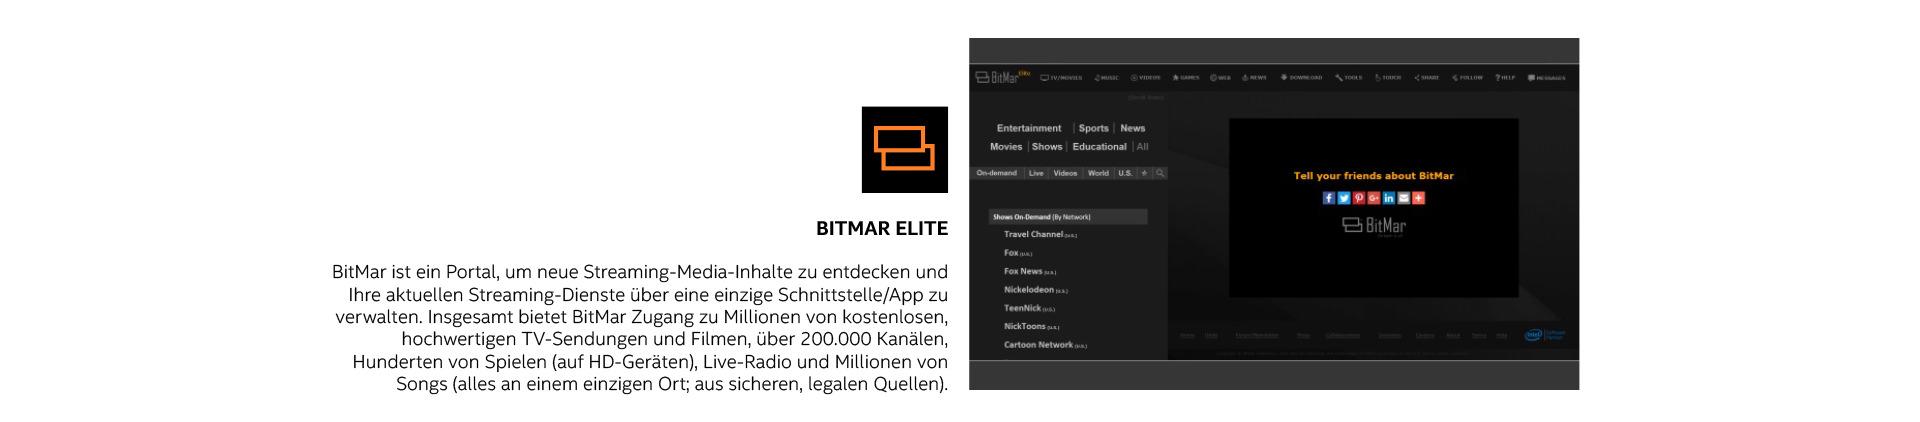 Bitmar Elite